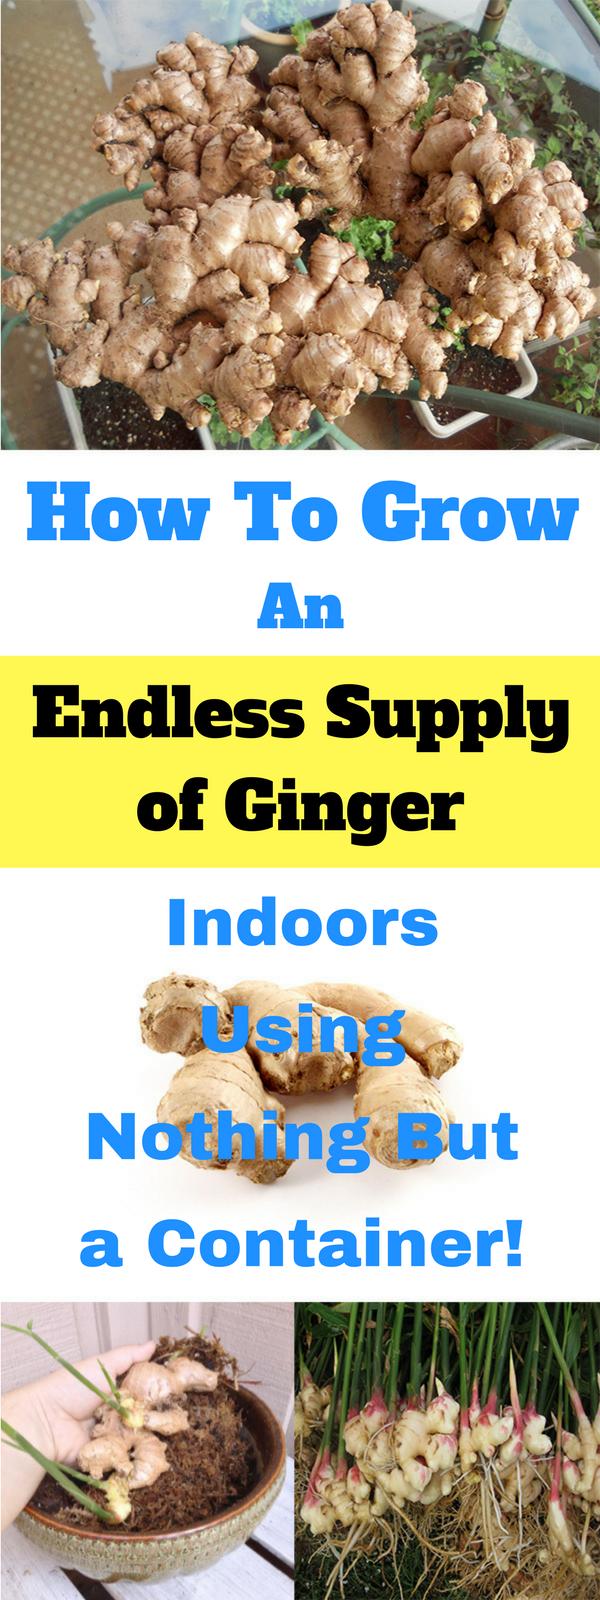 How To Grow G*Ng*R Indoors Indoor Vegetable Gardening 400 x 300